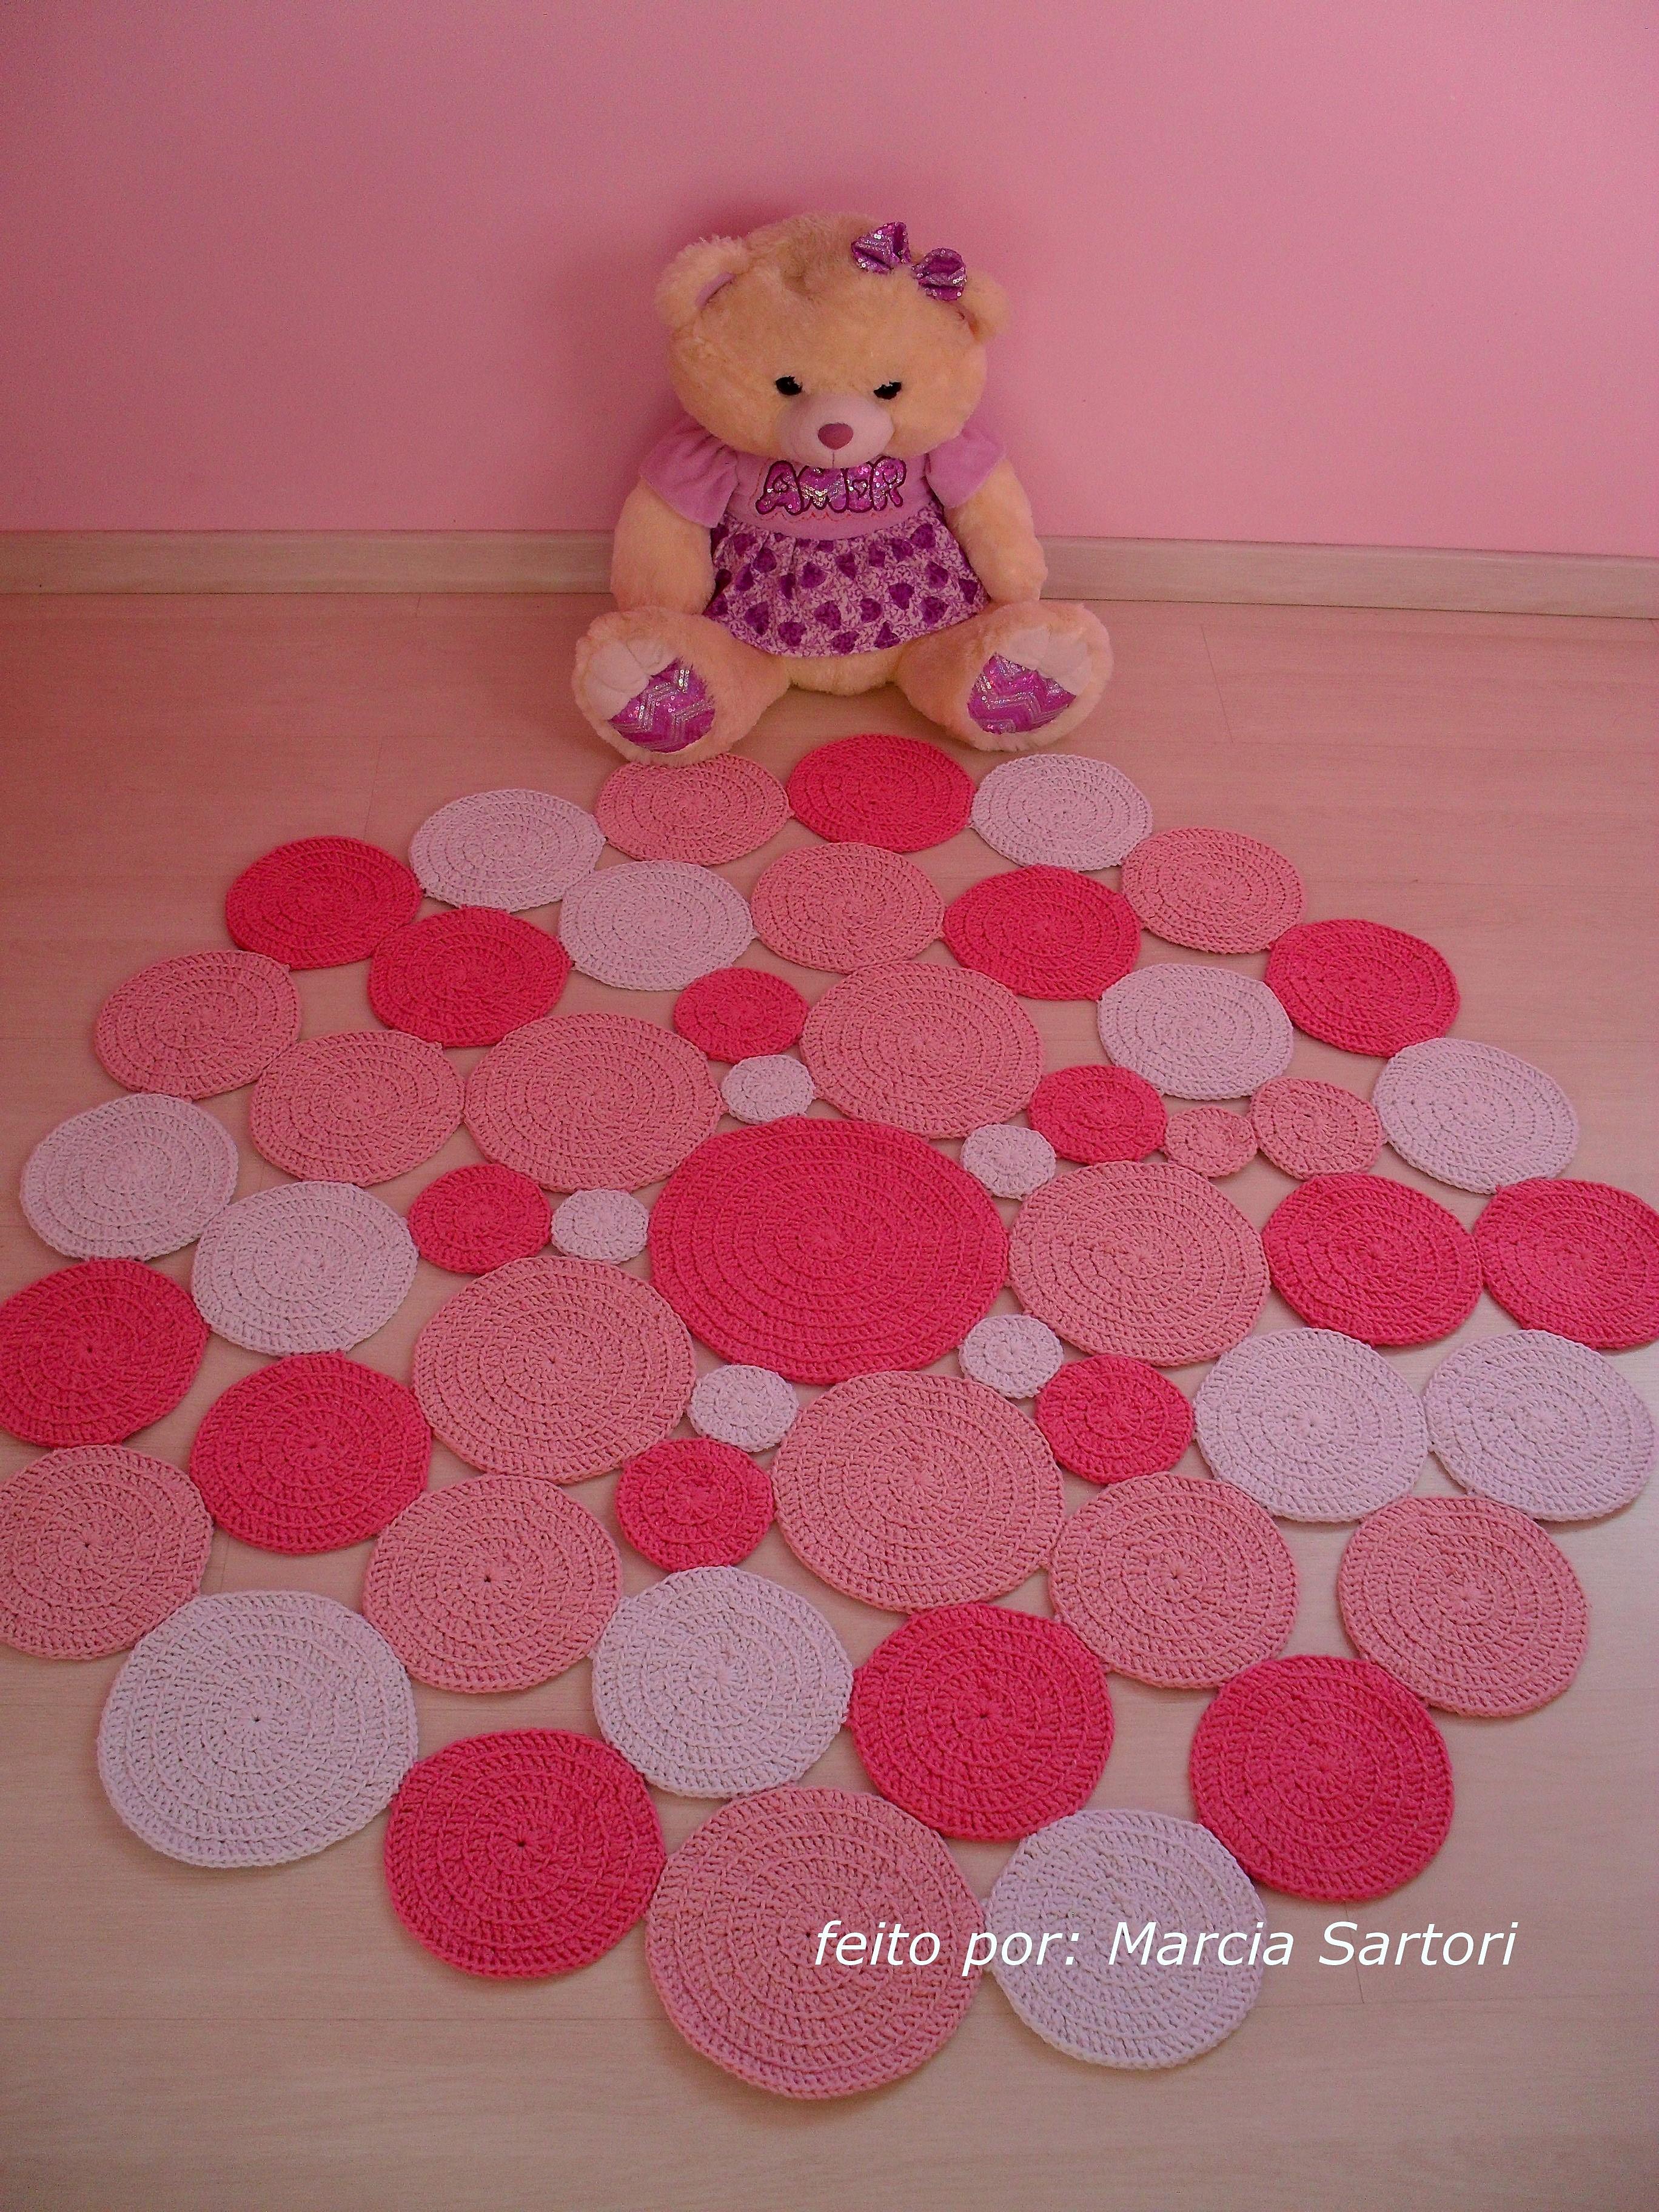 Tapete Rosa Bebe Redondo : tapete-de-bolas-redondo-tons-rosa-tapete-croche.jpg